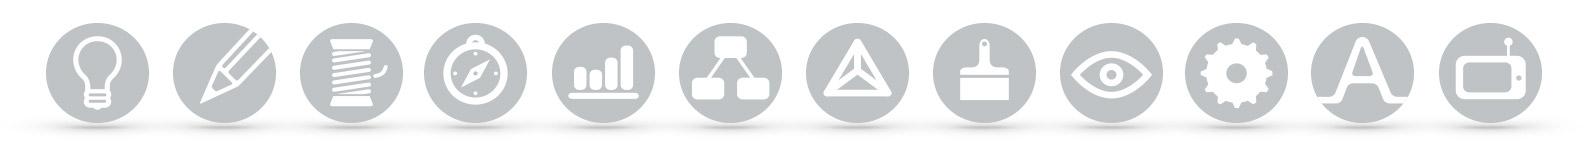 Kompetenzen-Icons der TE + TE Werbeagentur